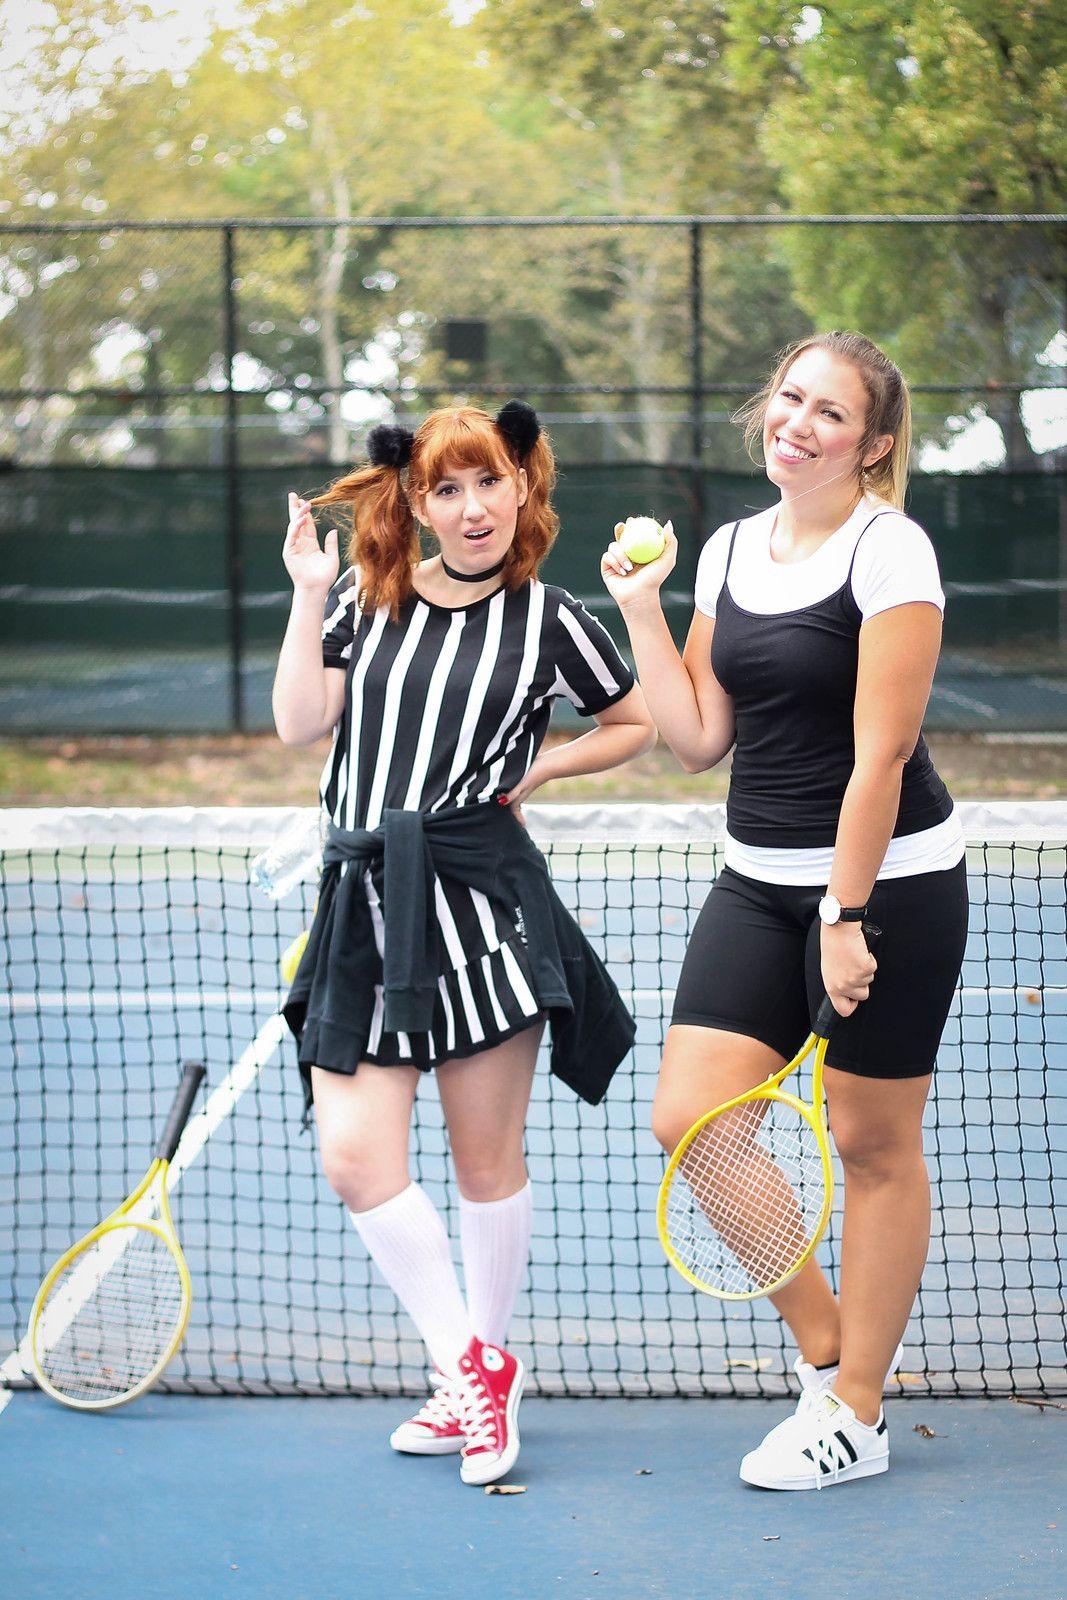 16 Best Clueless Costume Ideas Cher Clueless Costume Ideas For Halloween